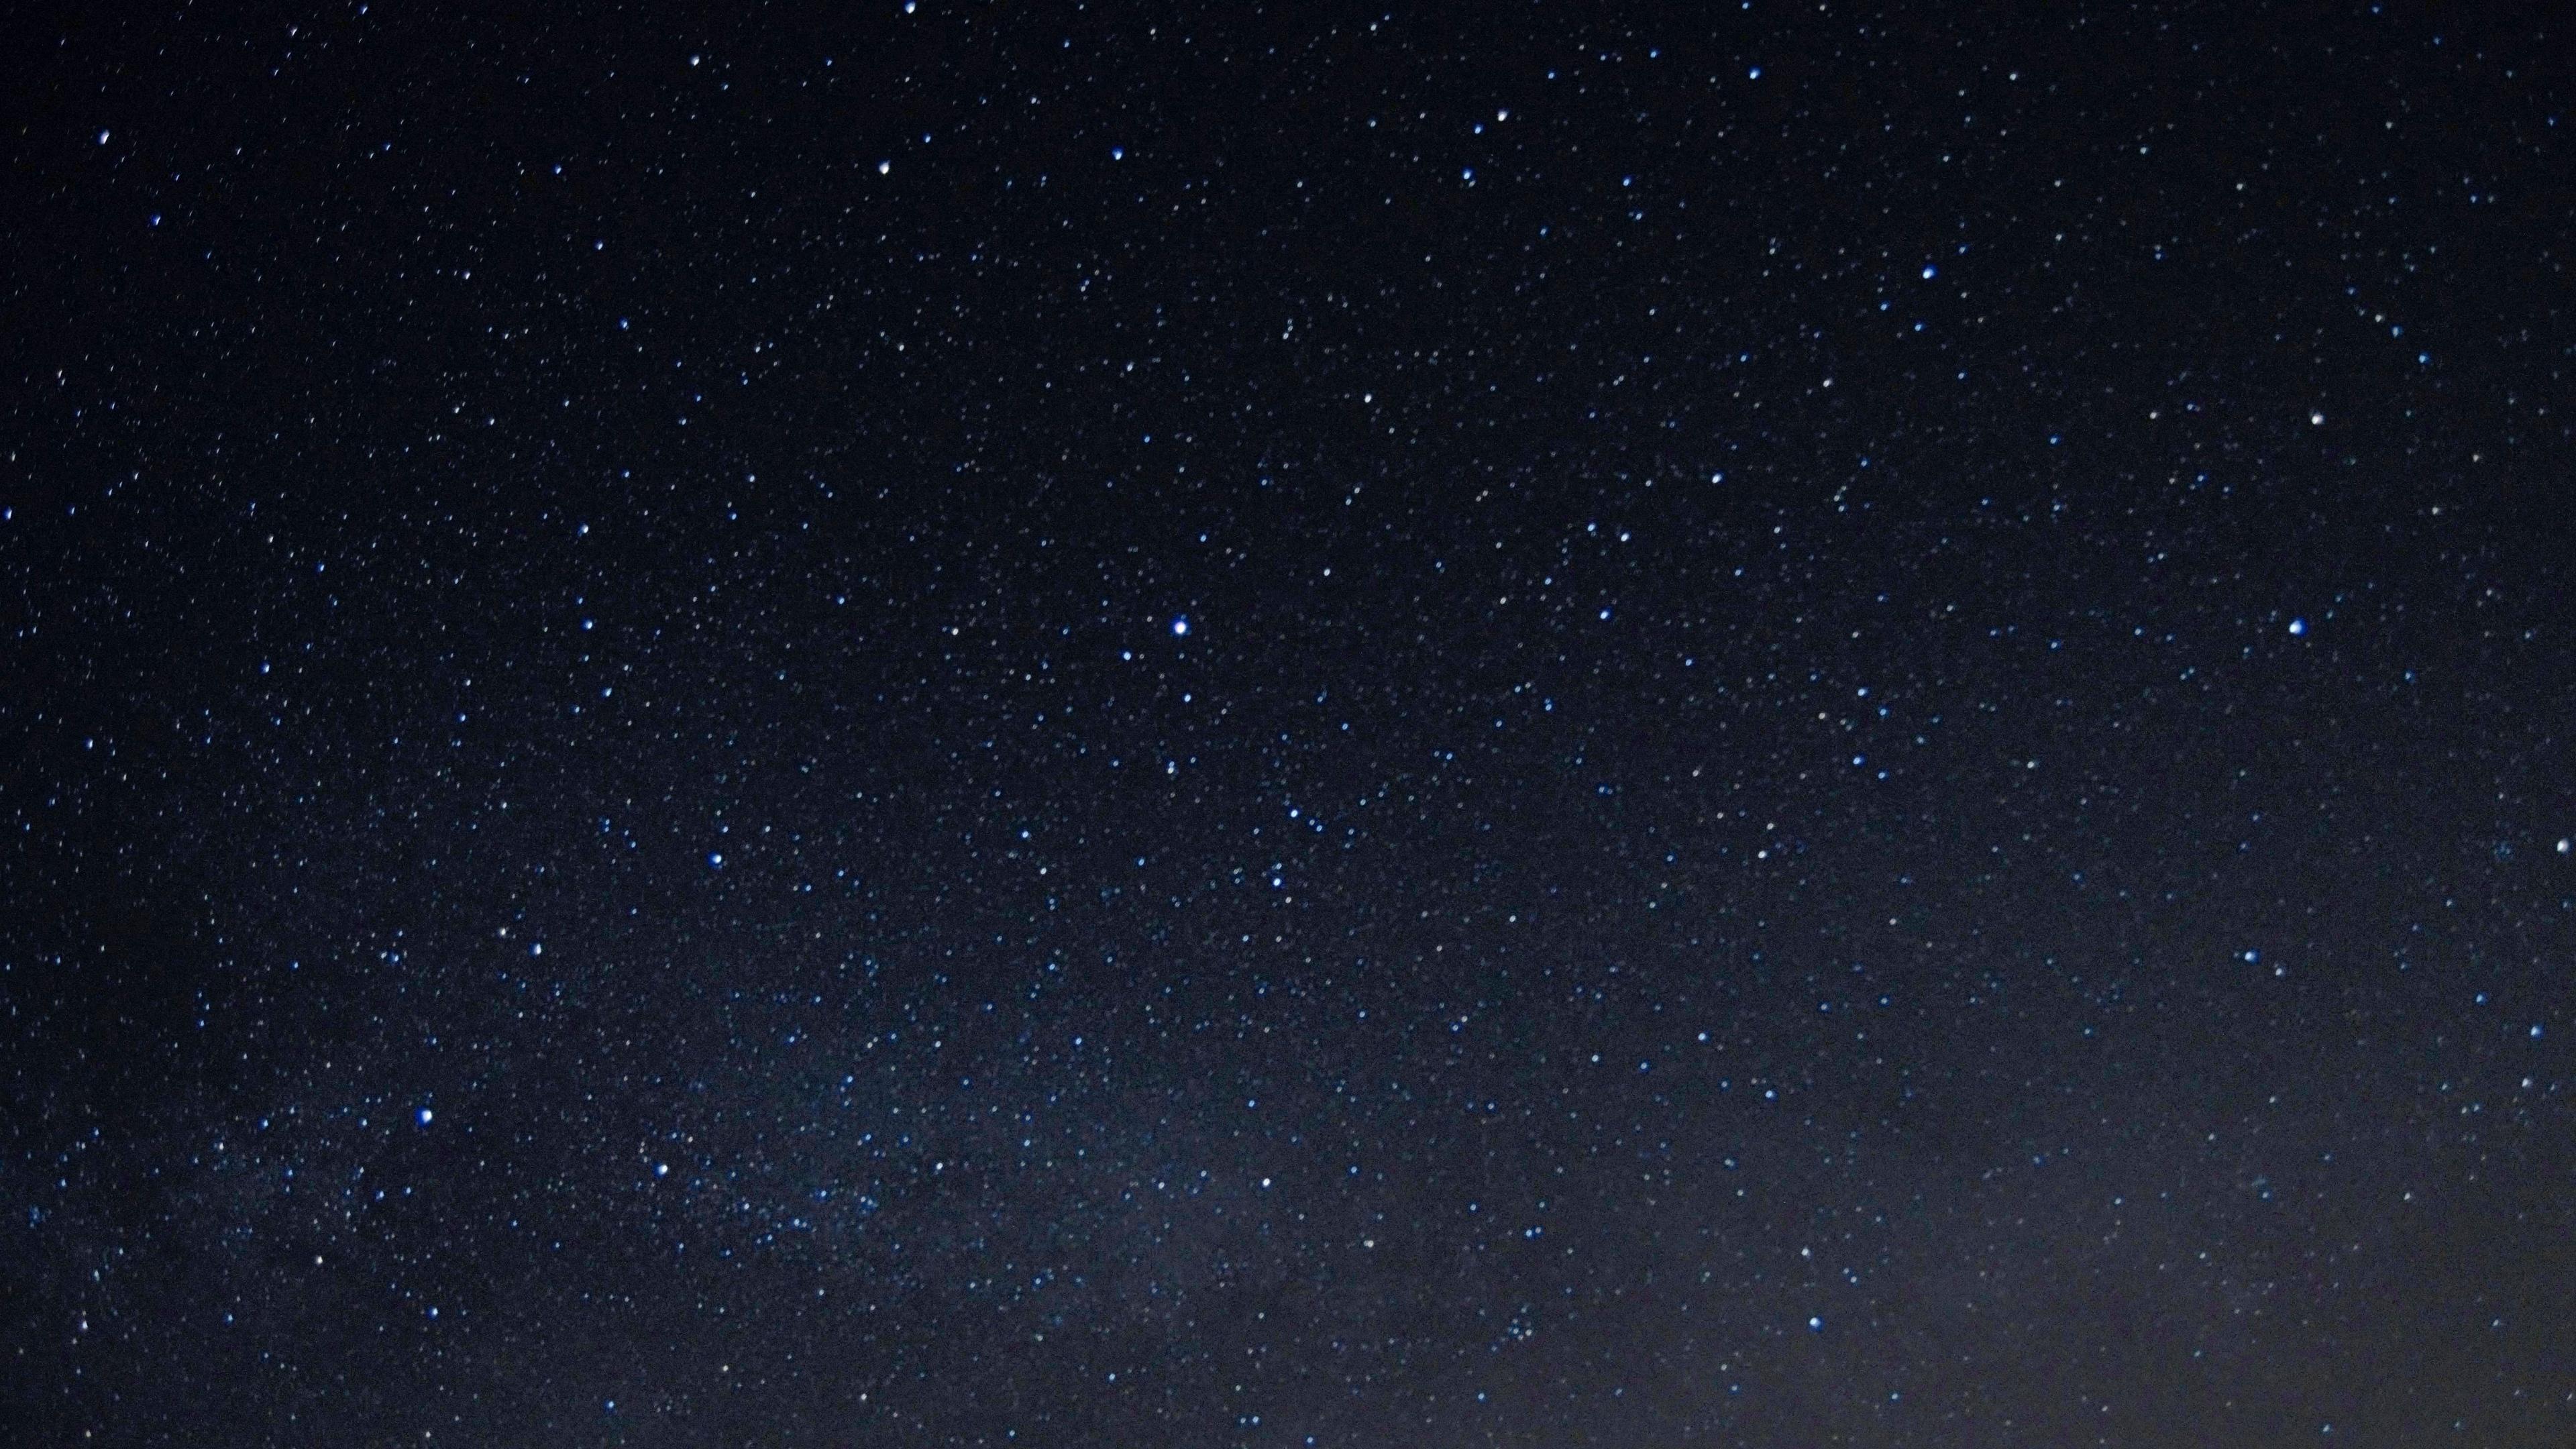 starry sky night stars 4k 1536017183 - starry sky, night, stars 4k - Stars, starry sky, Night